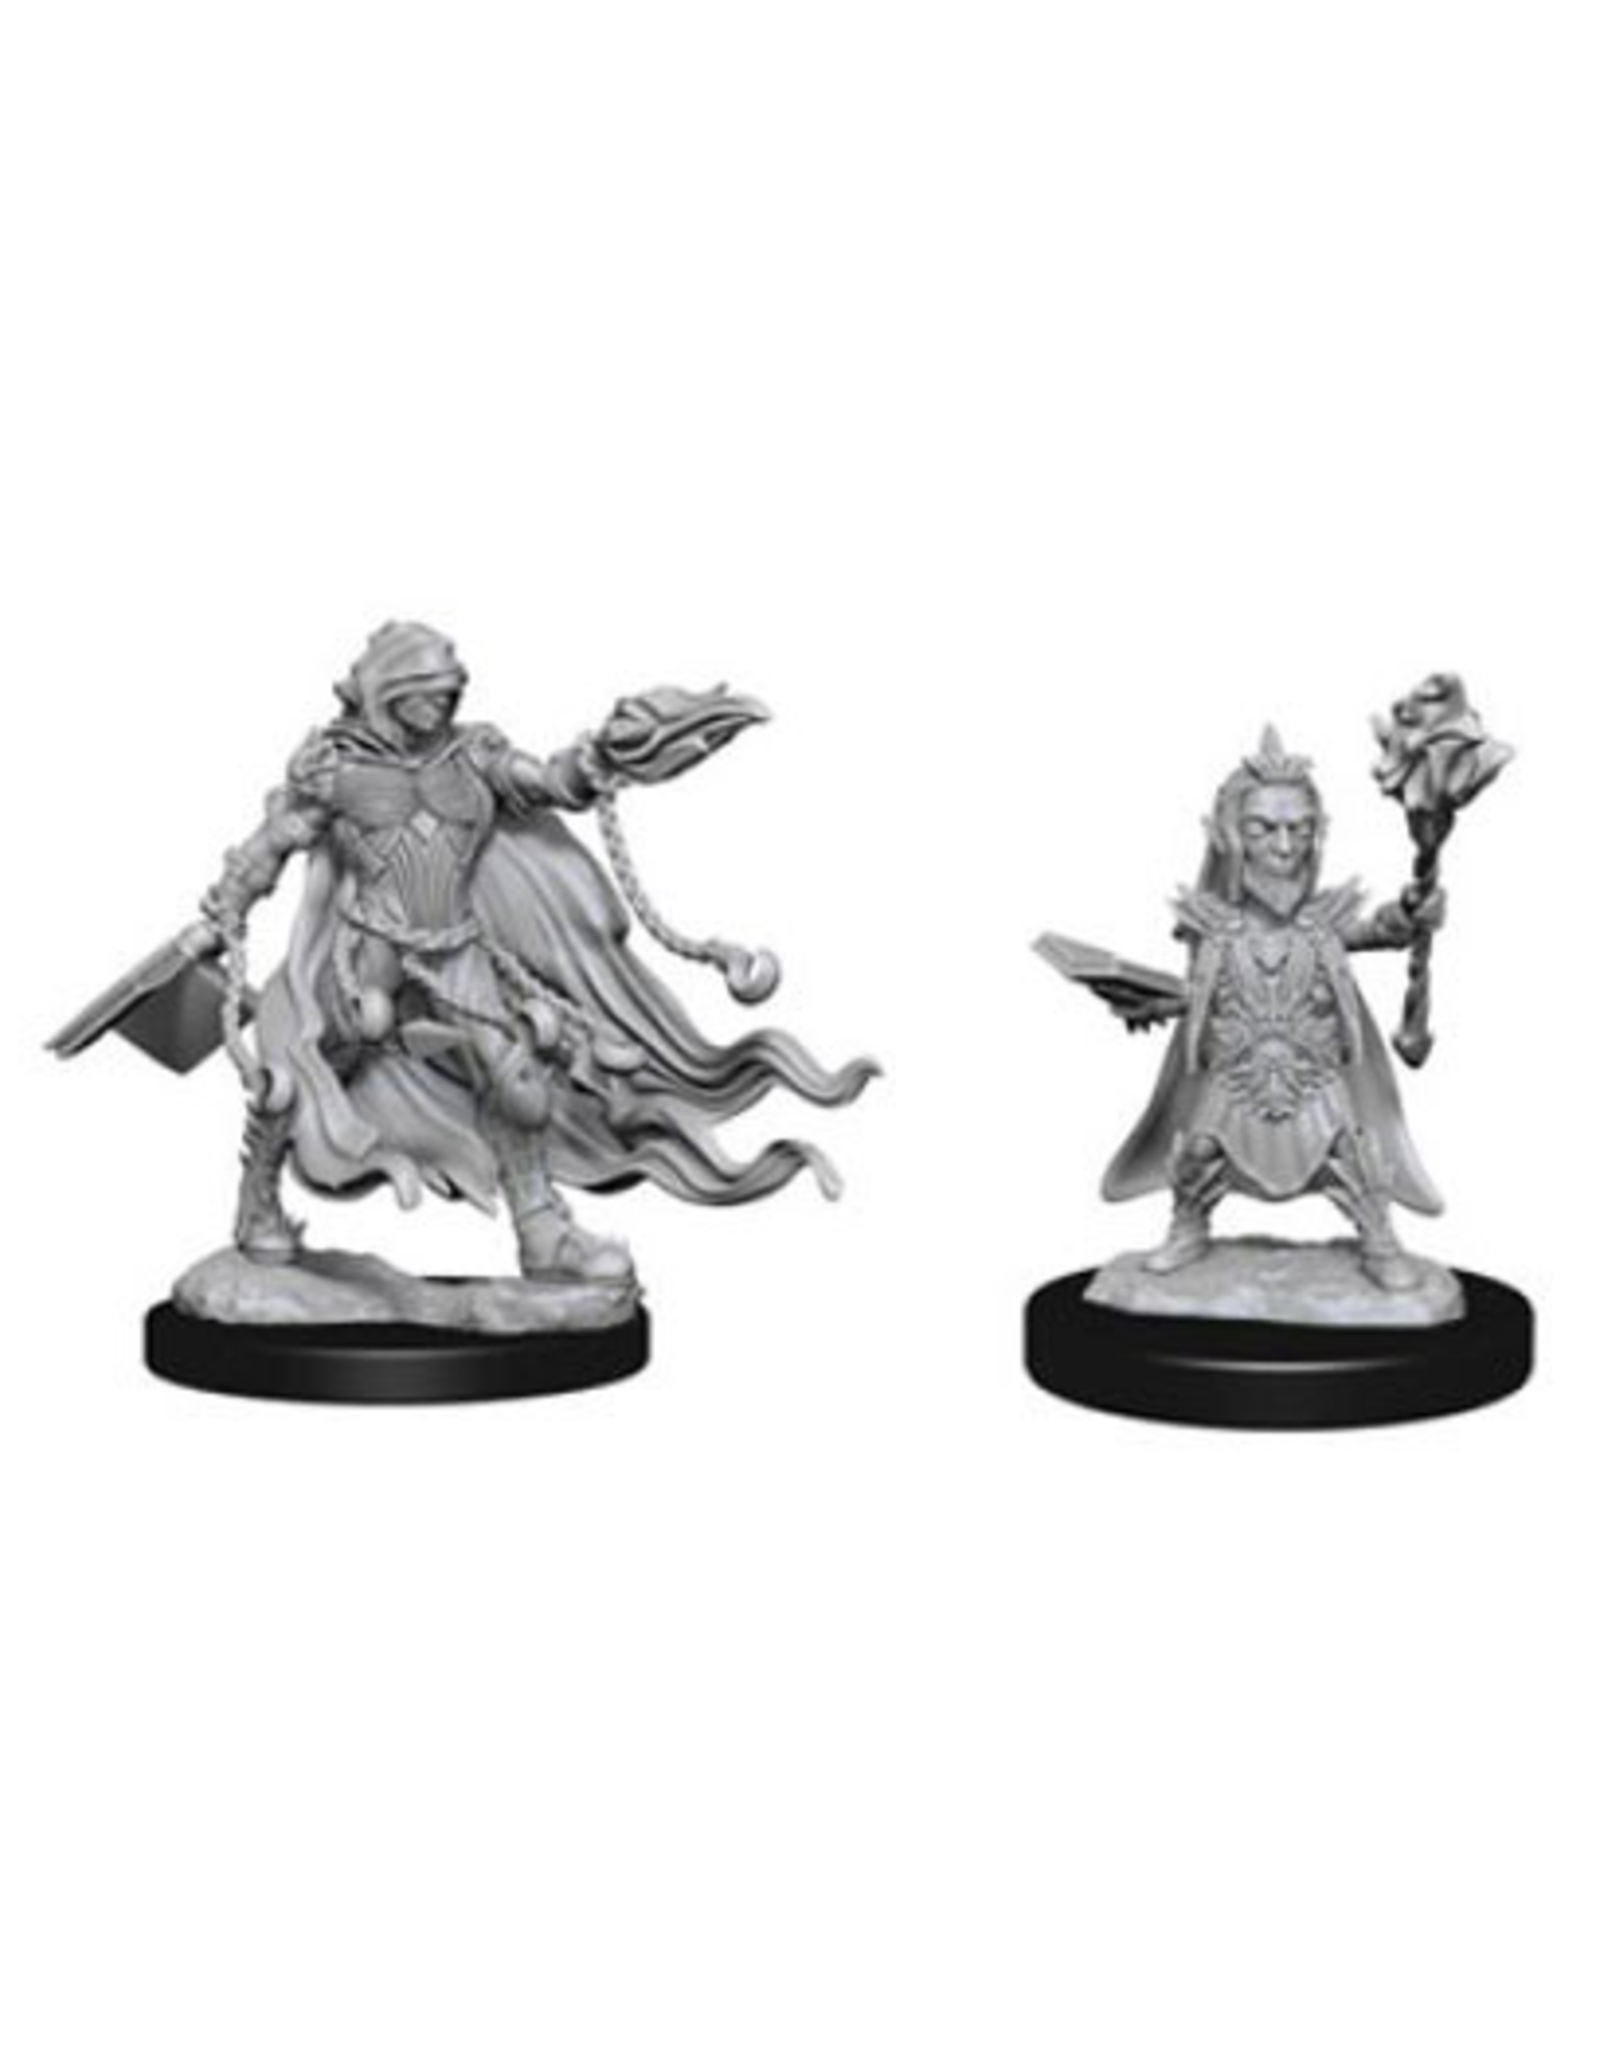 Wizkids Evil Wizards: PF Deep Cuts Unpainted Miniatures